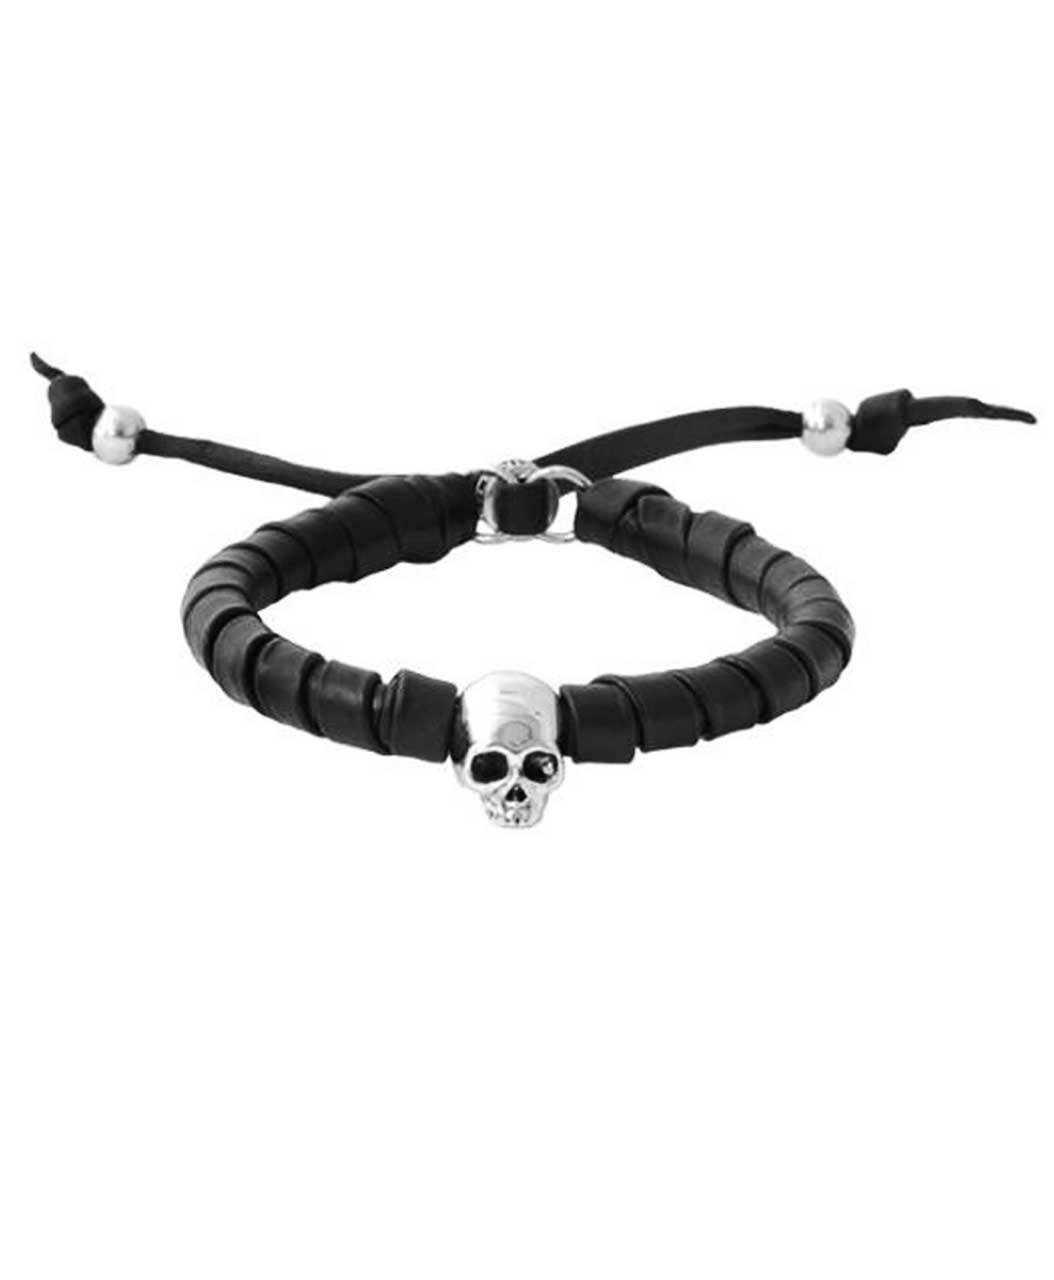 King Baby Black Leather Bracelet With Hamlet Skull Silver